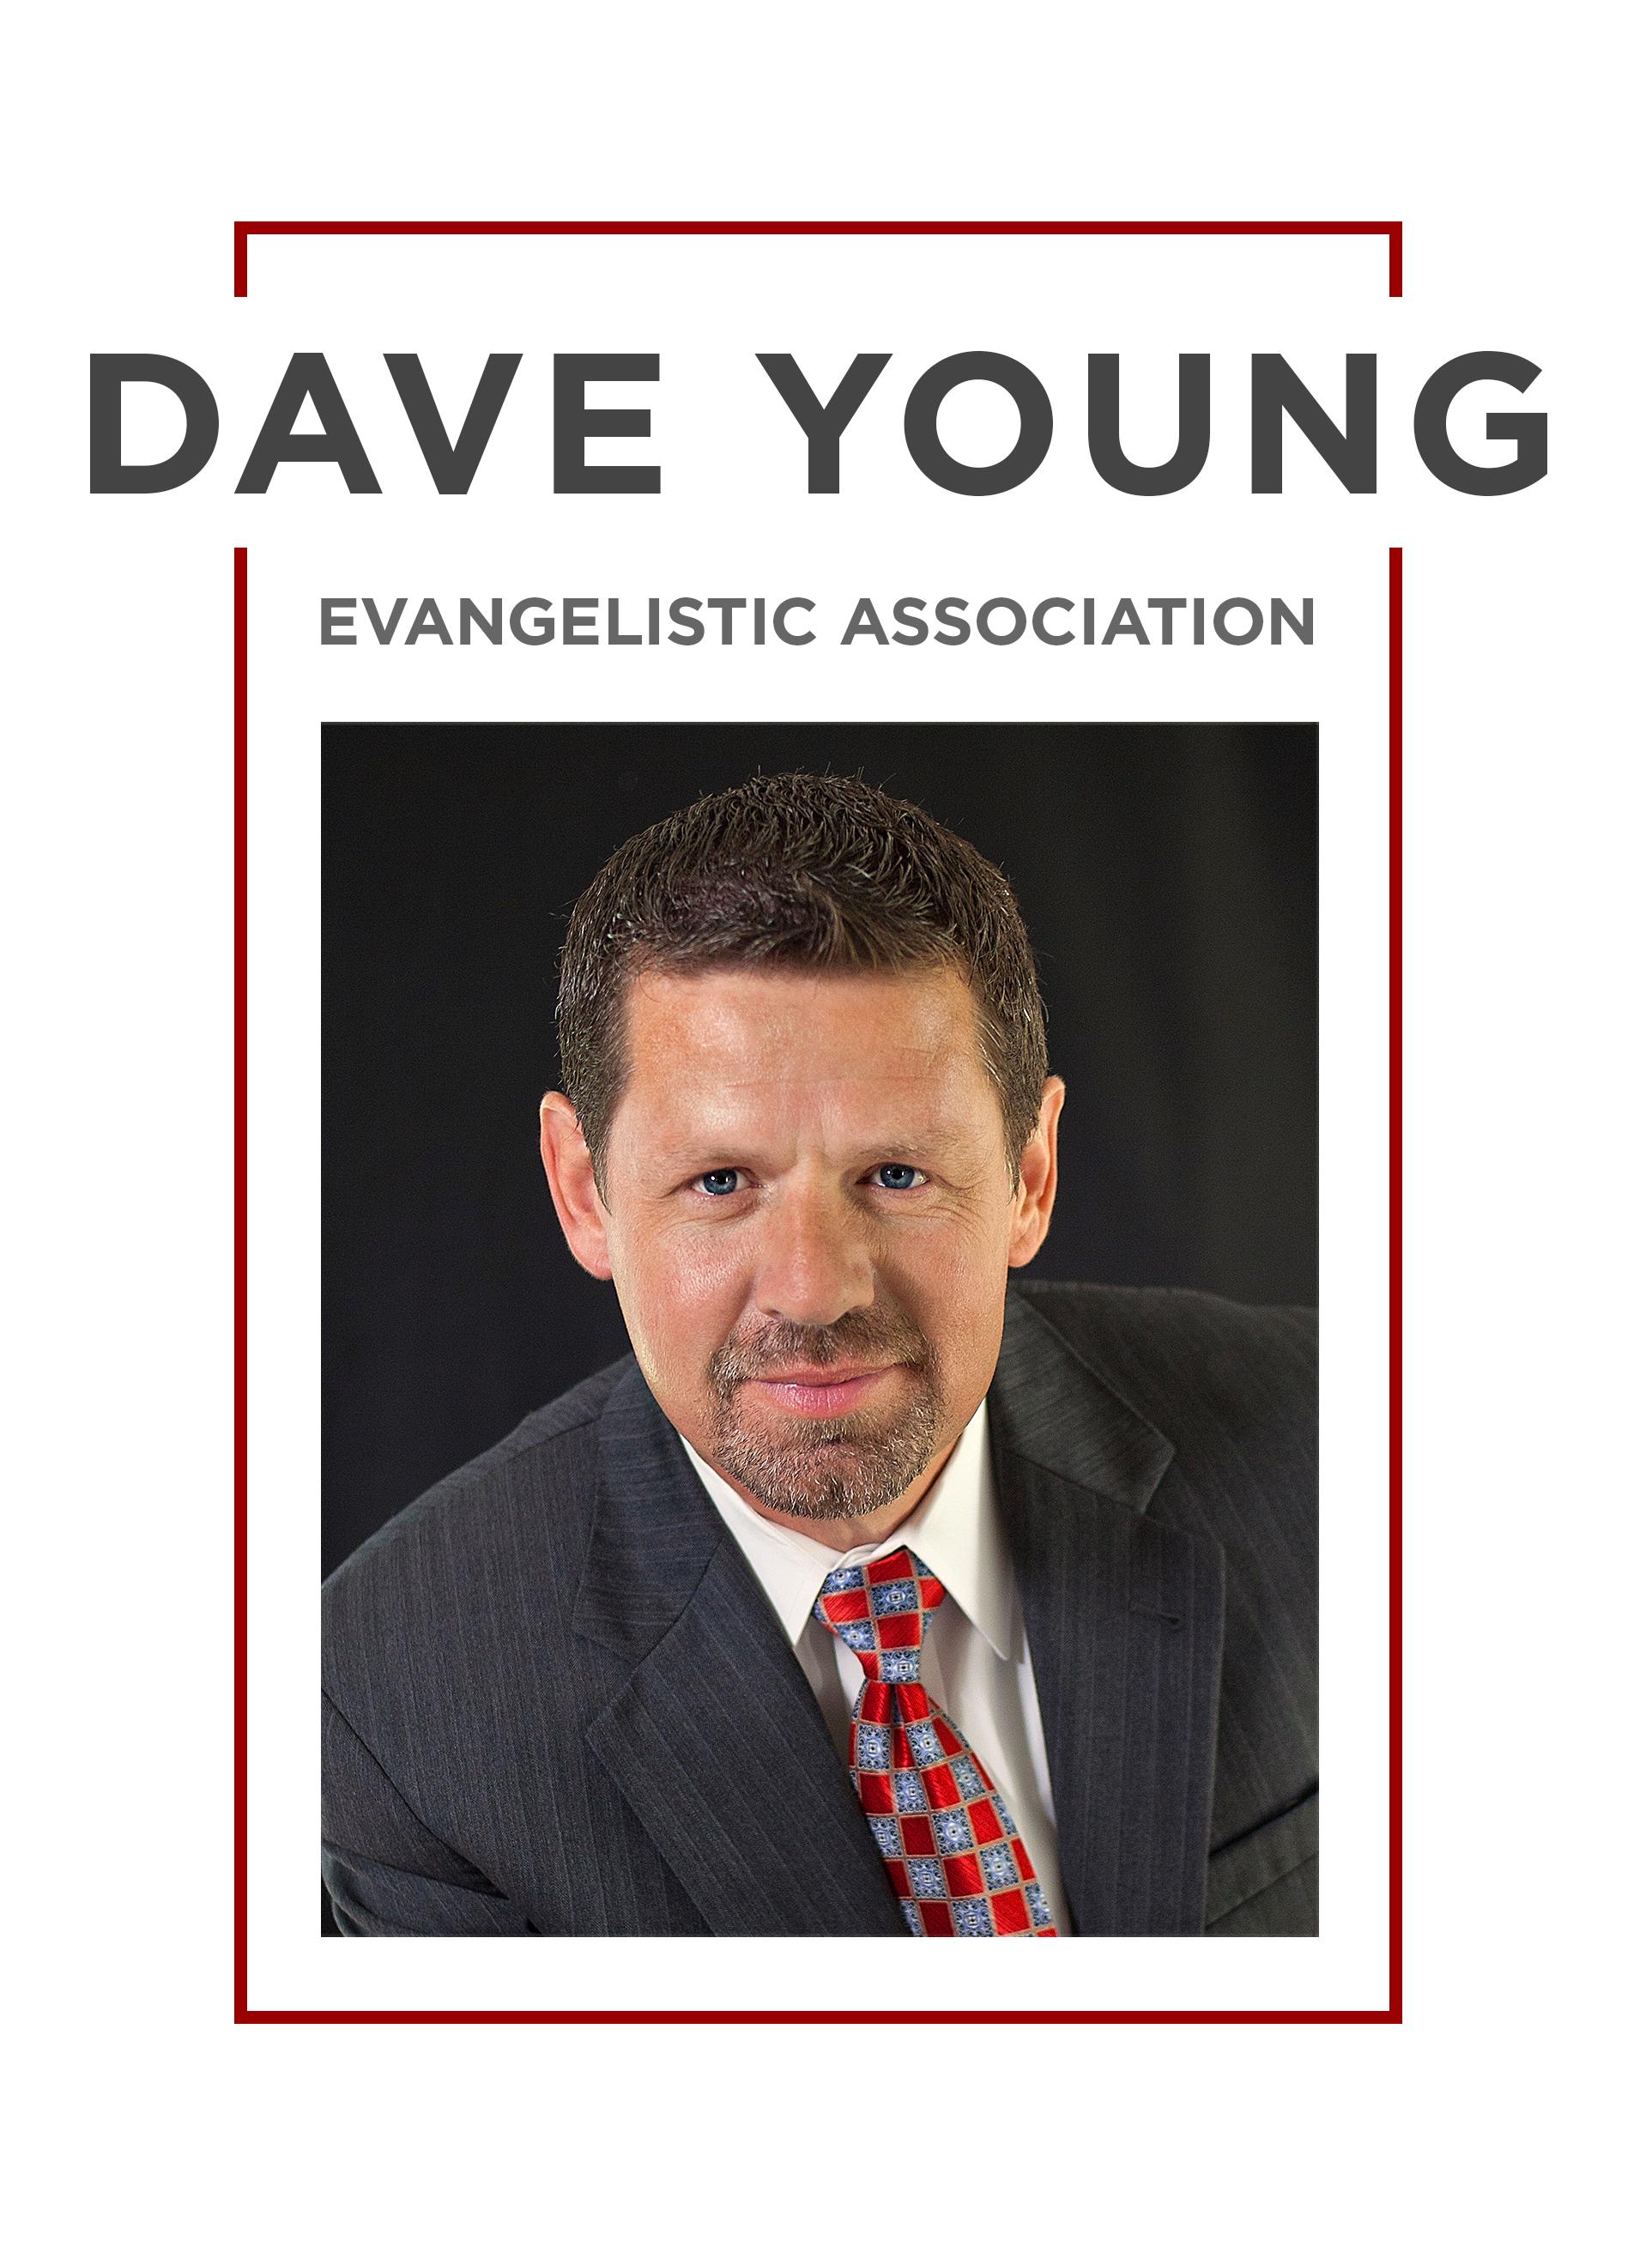 Dating evangelism